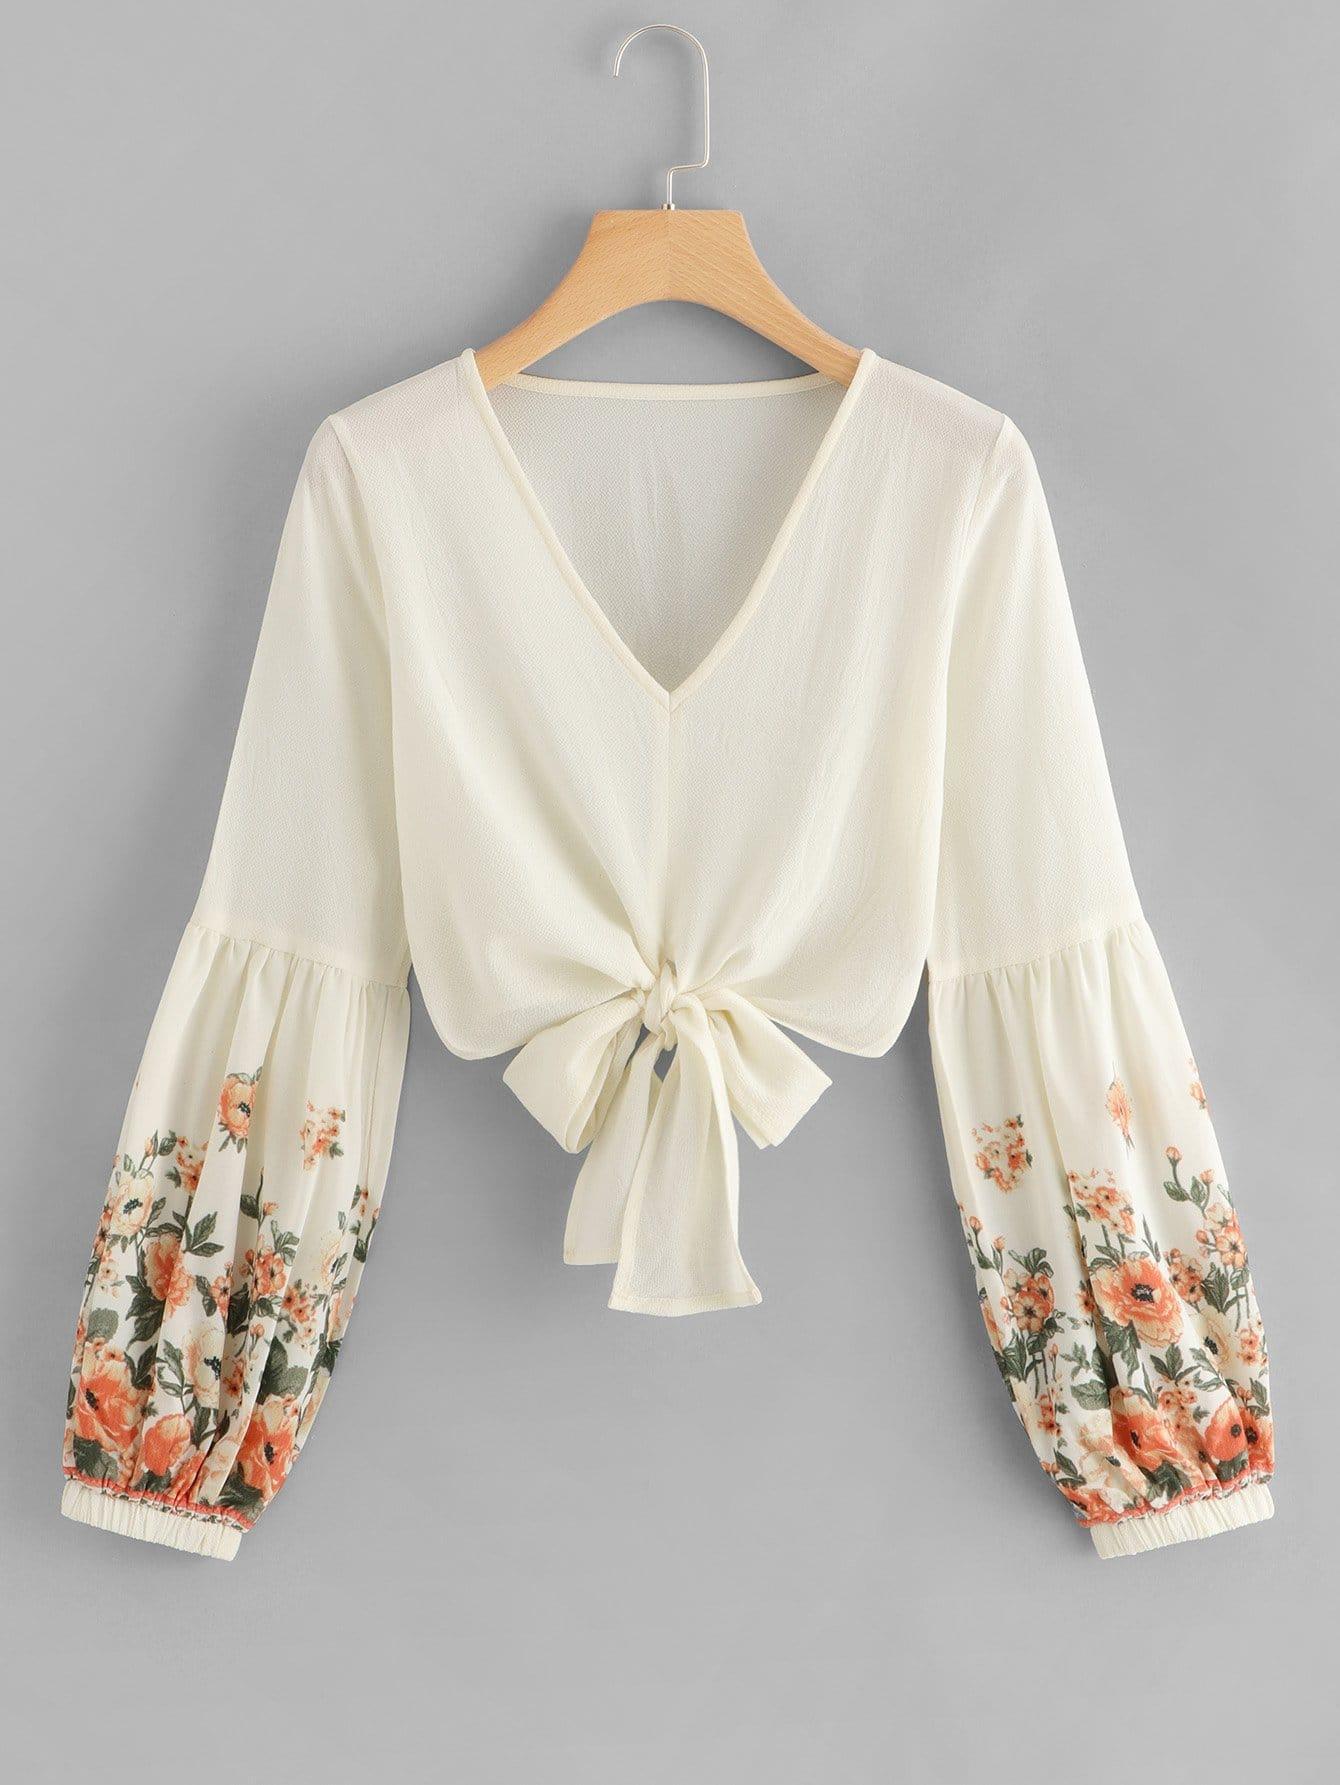 Купить Ситцевая блуза с бантом, null, SheIn